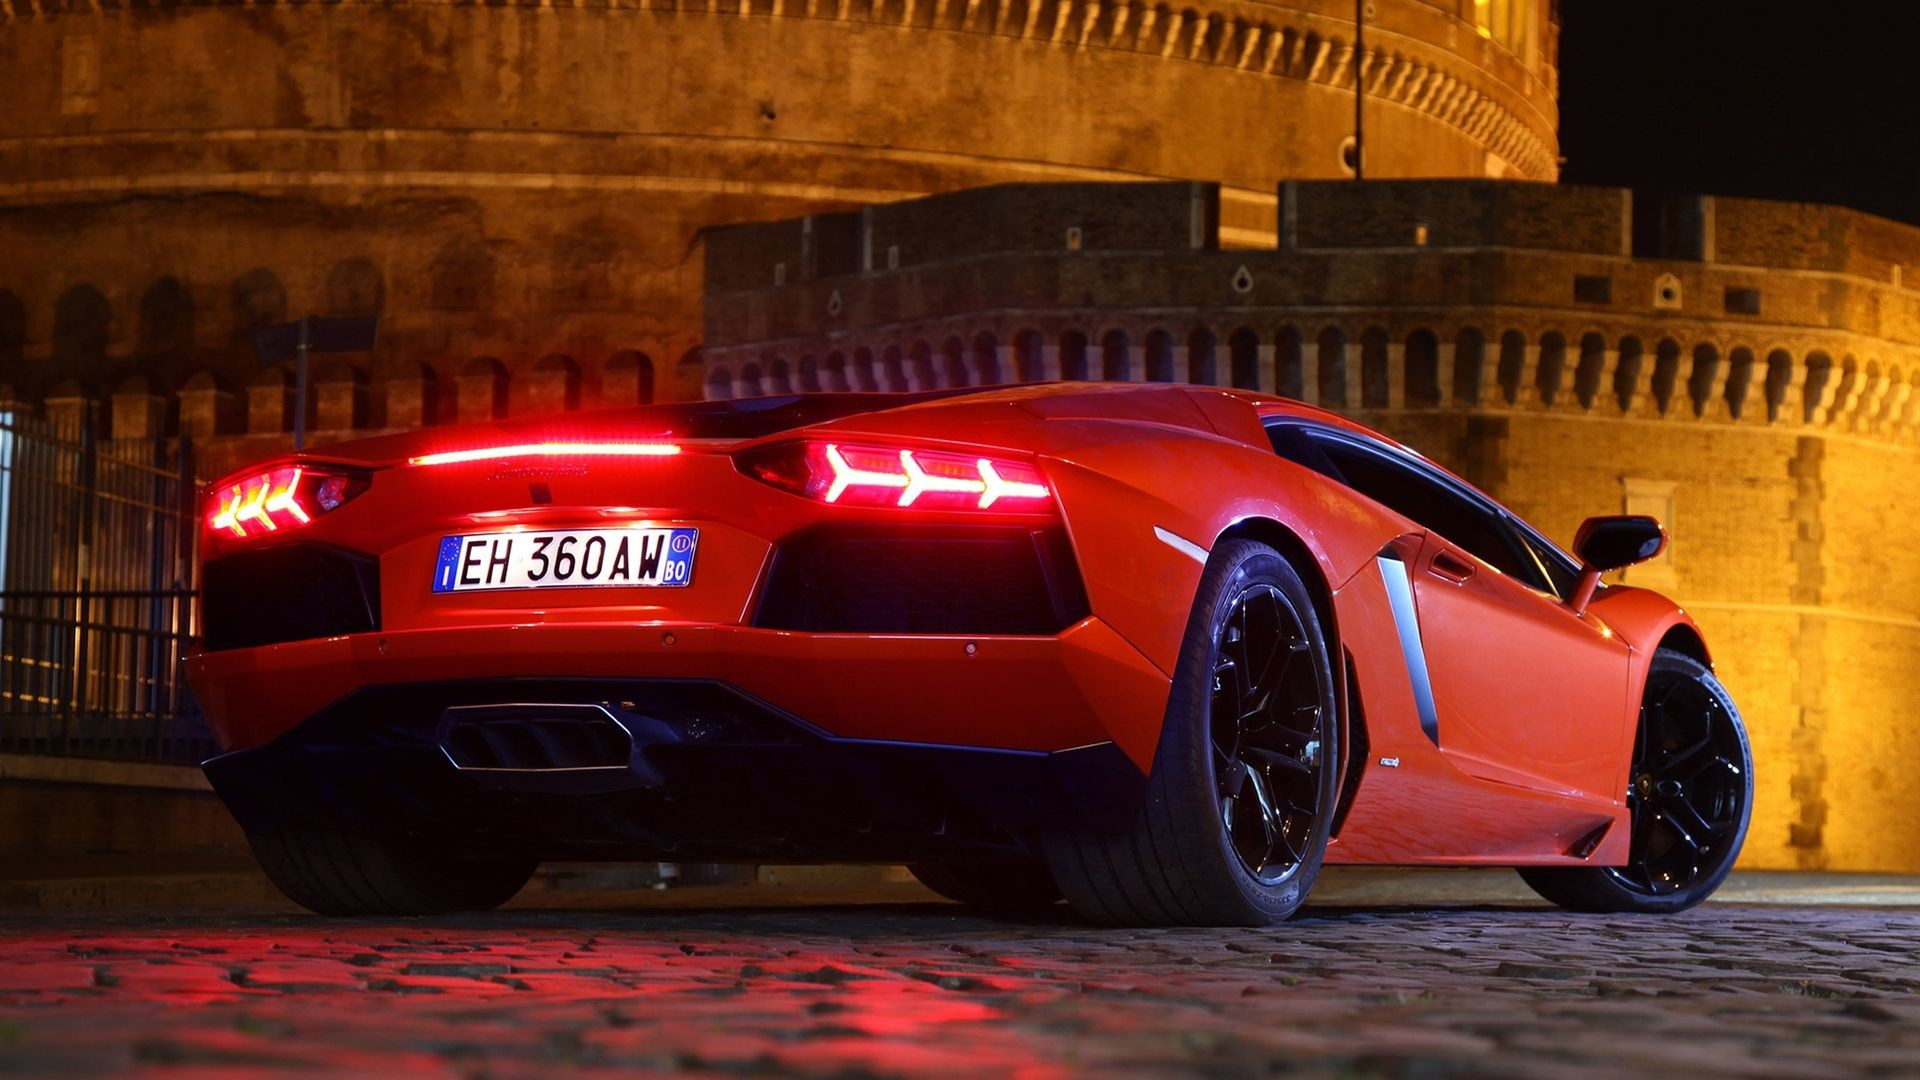 Red Lamborghini Aventador HD Wallpapers 1080p Cars